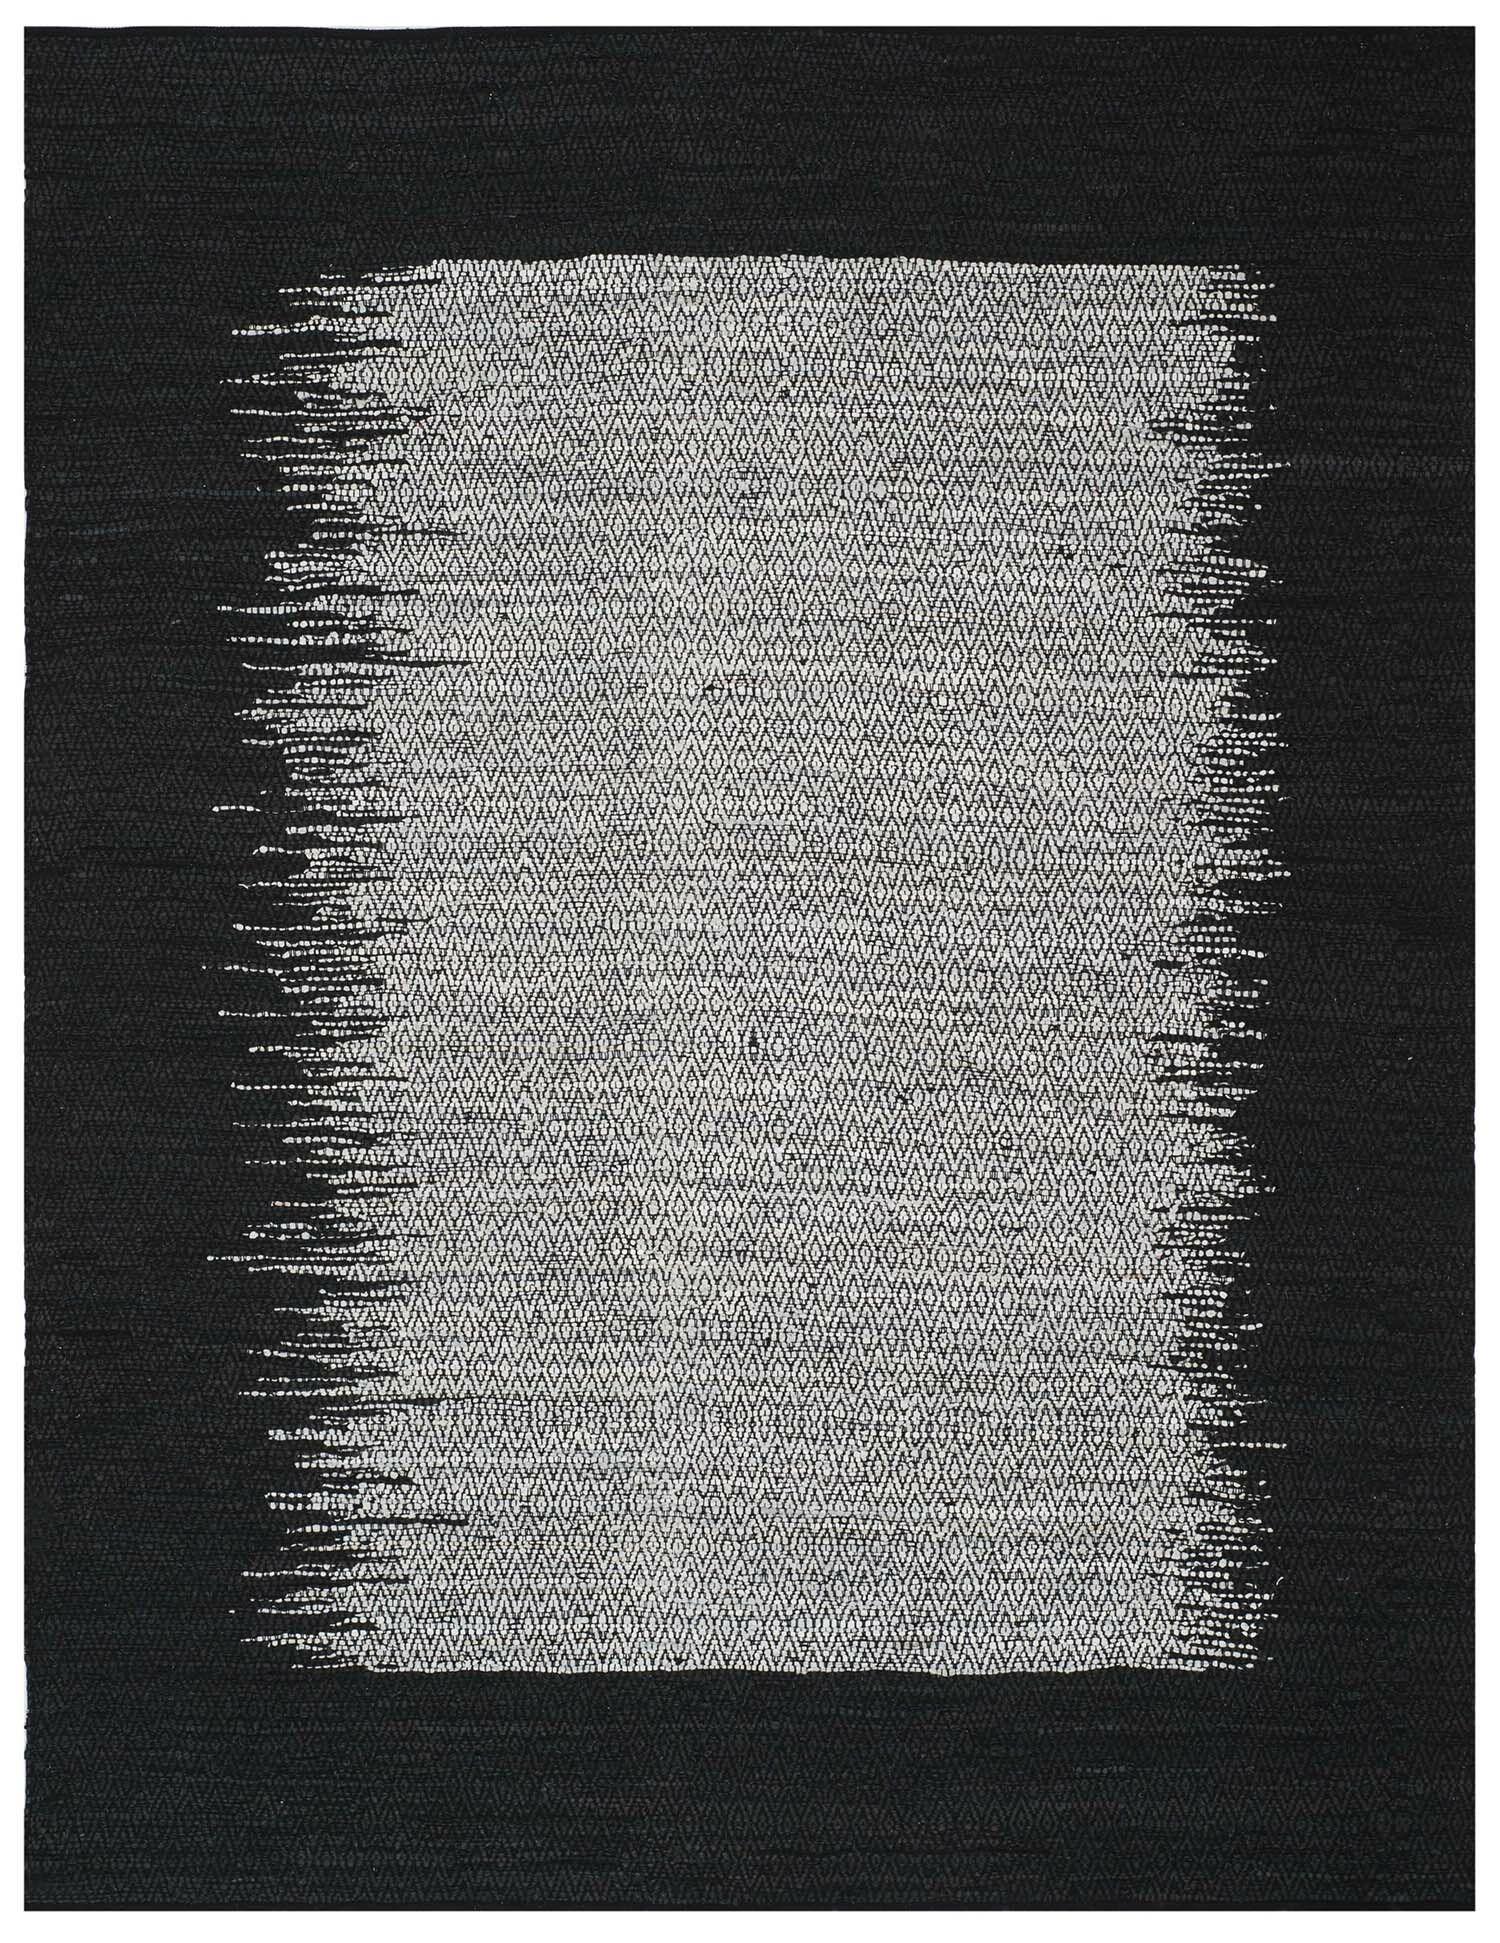 Logan Hand-Woven Light Gray Area Rug Rug Size: Rectangle 2' x 3'